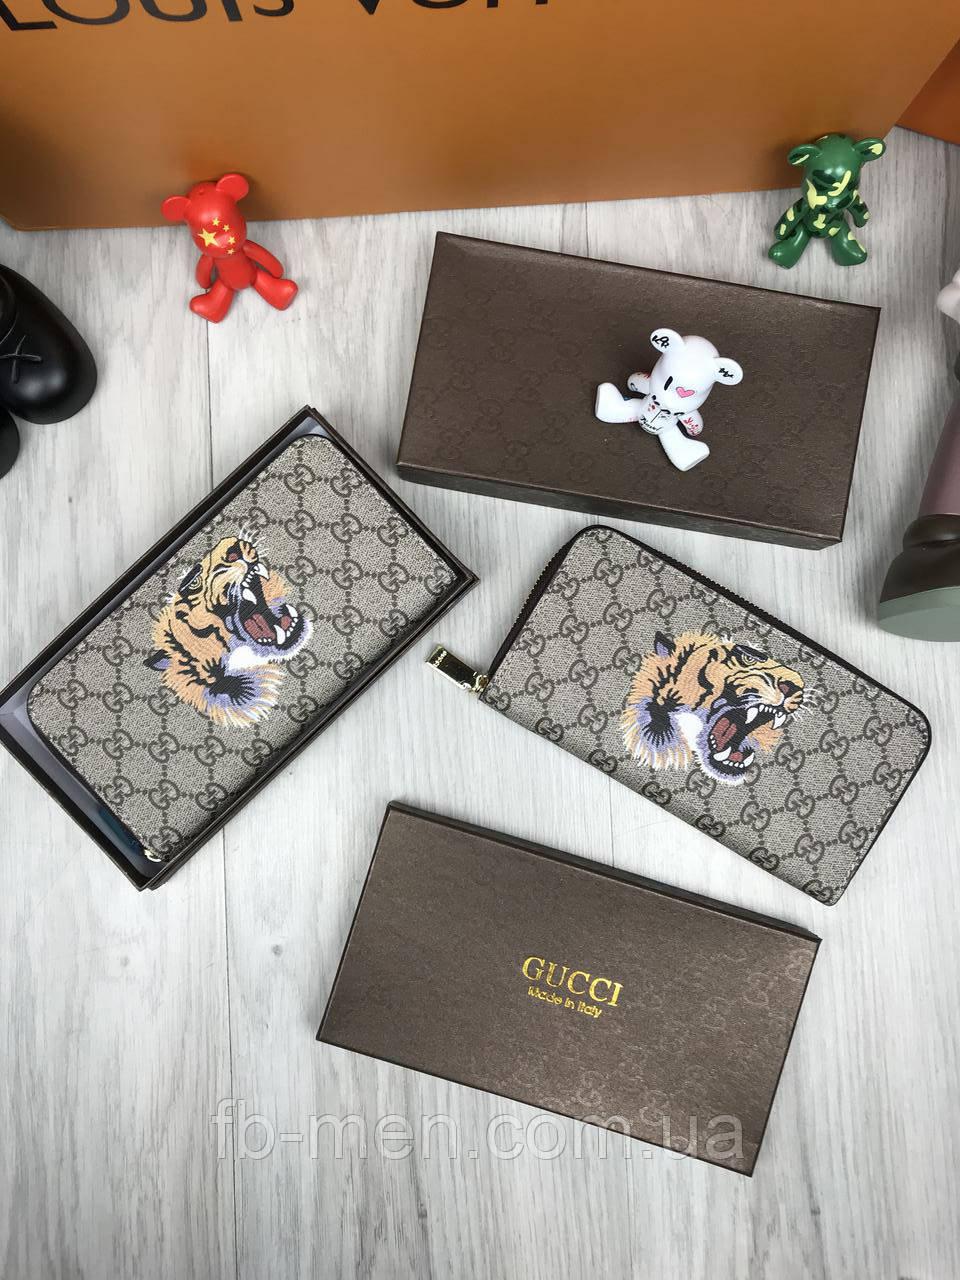 Кошелек Gucci мужской женский   Бумажни Gucci тигр бежевый   Органайзер для денег Гуччи тигры коричневый